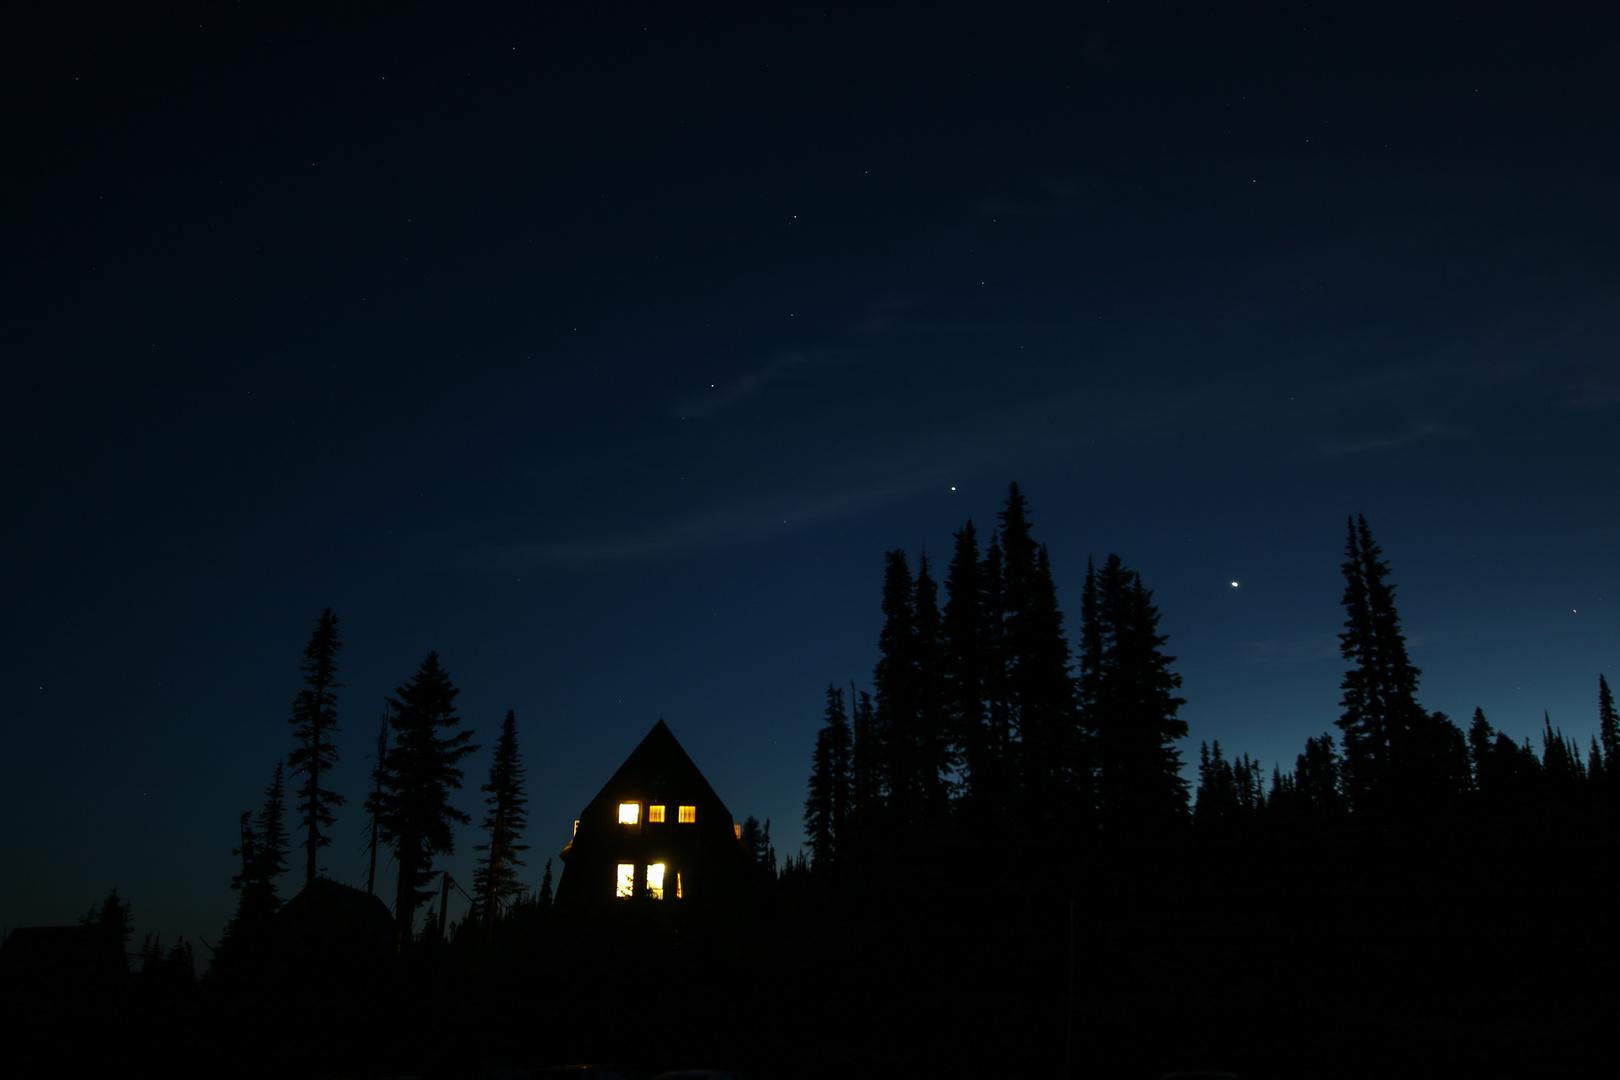 Hexenhäuschen bei Nacht